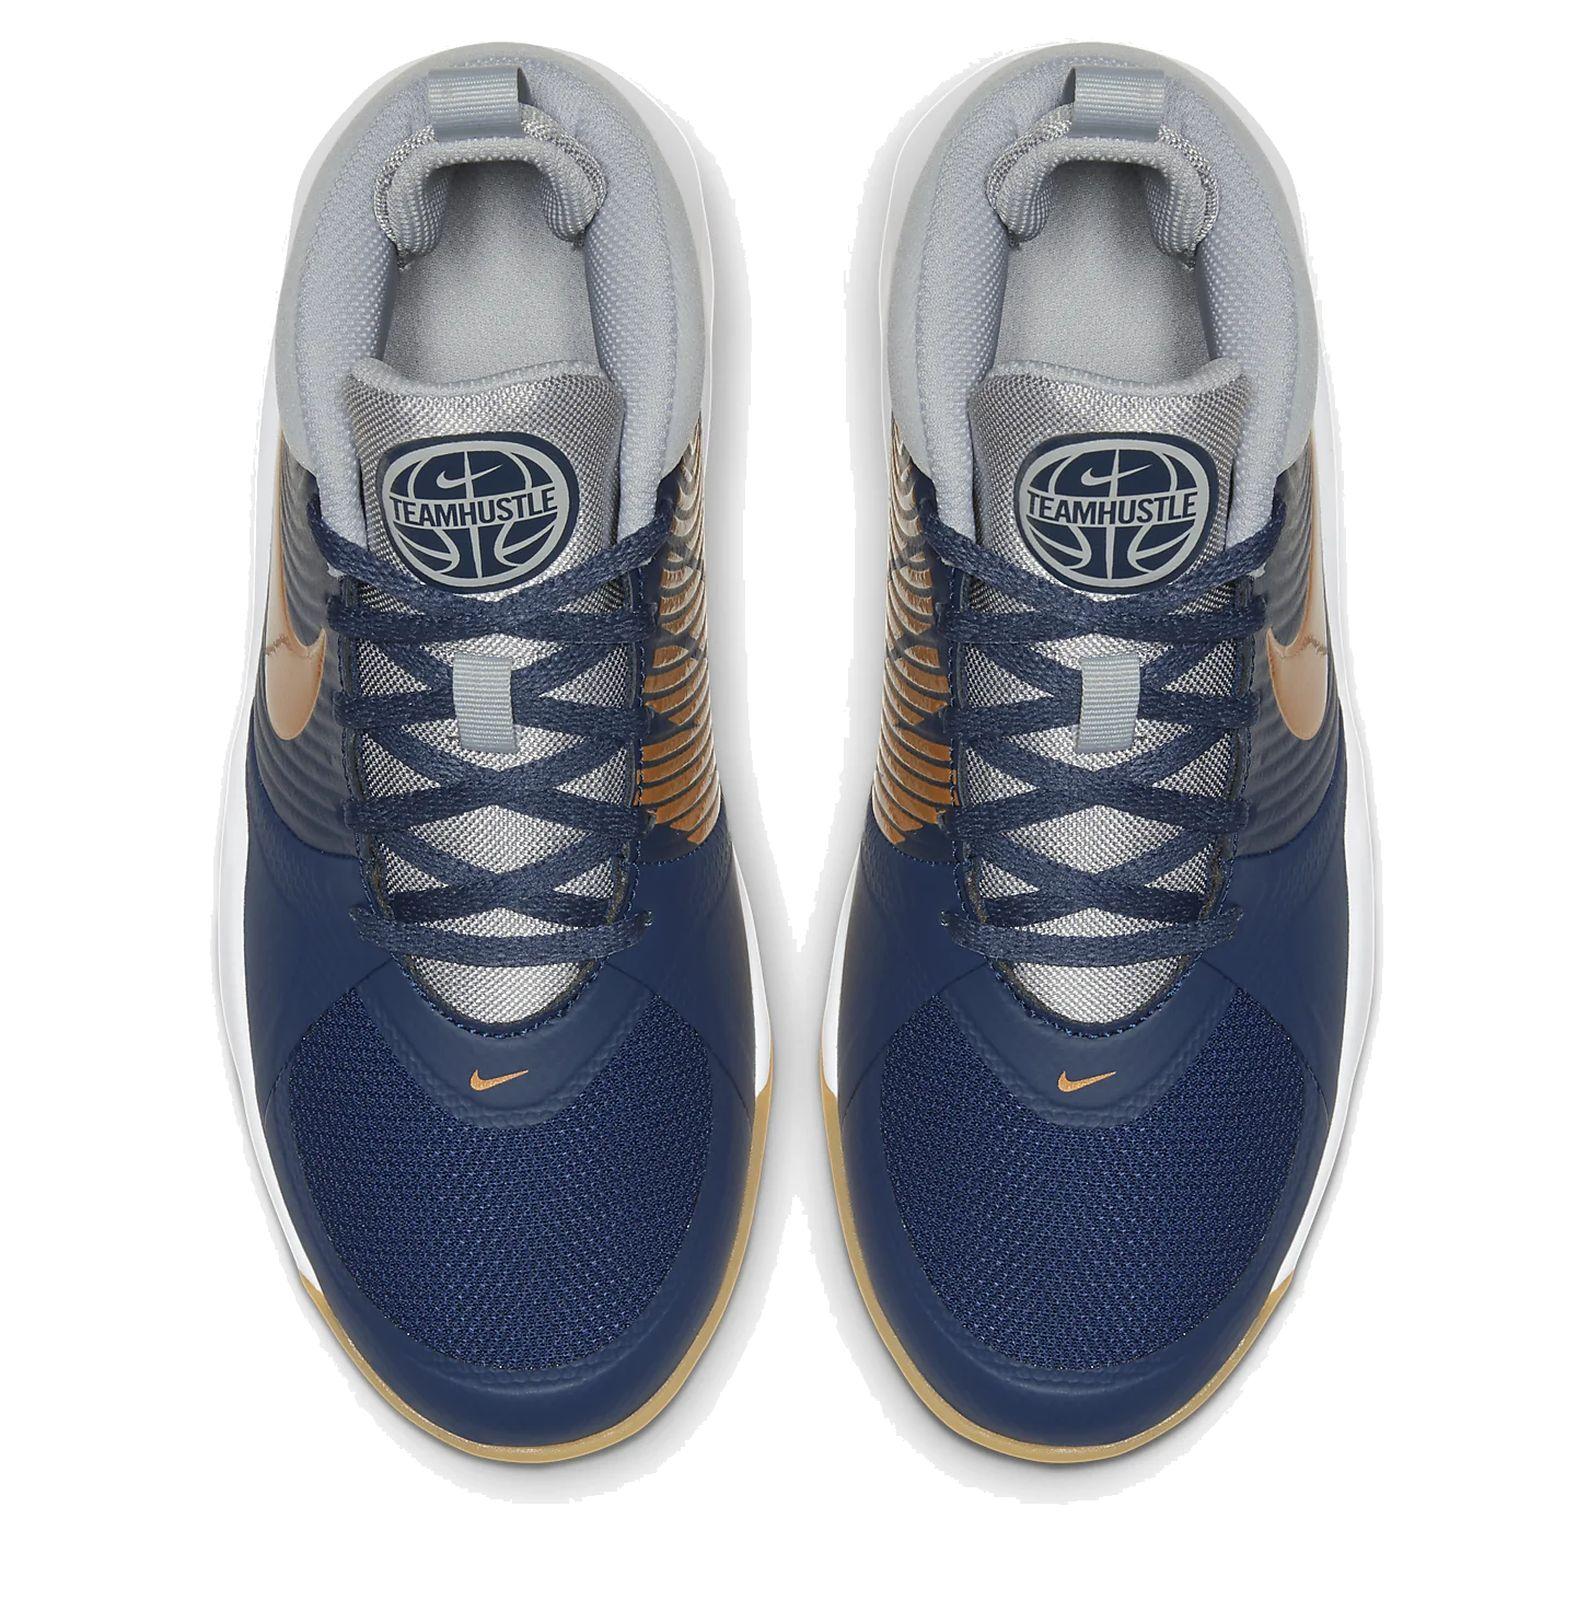 Details zu Nike Kinder Freizeit Basketball Schuhe Team Hustle D 9 blau